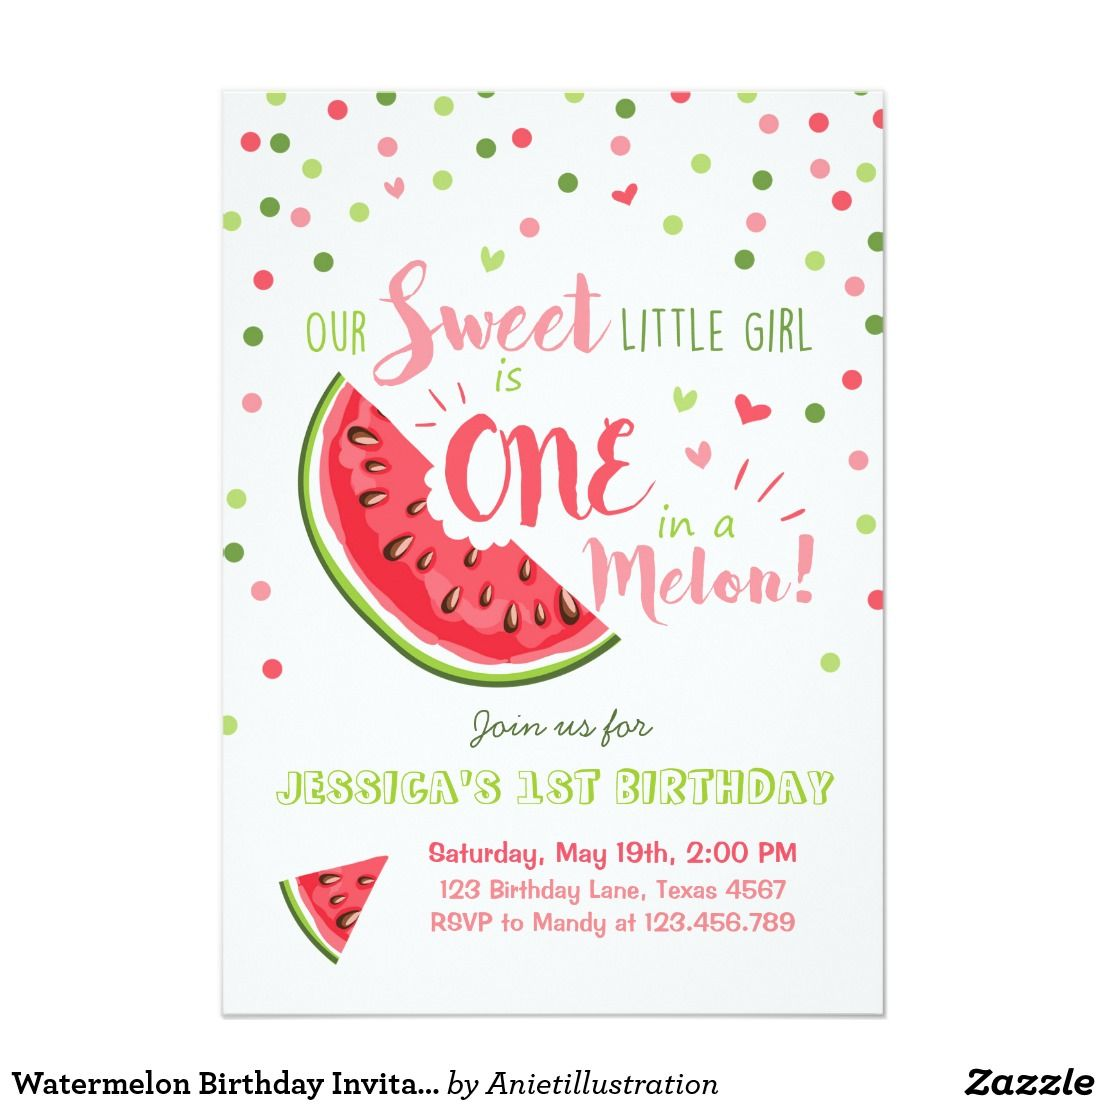 watermelon birthday invitation melon summer party melon party